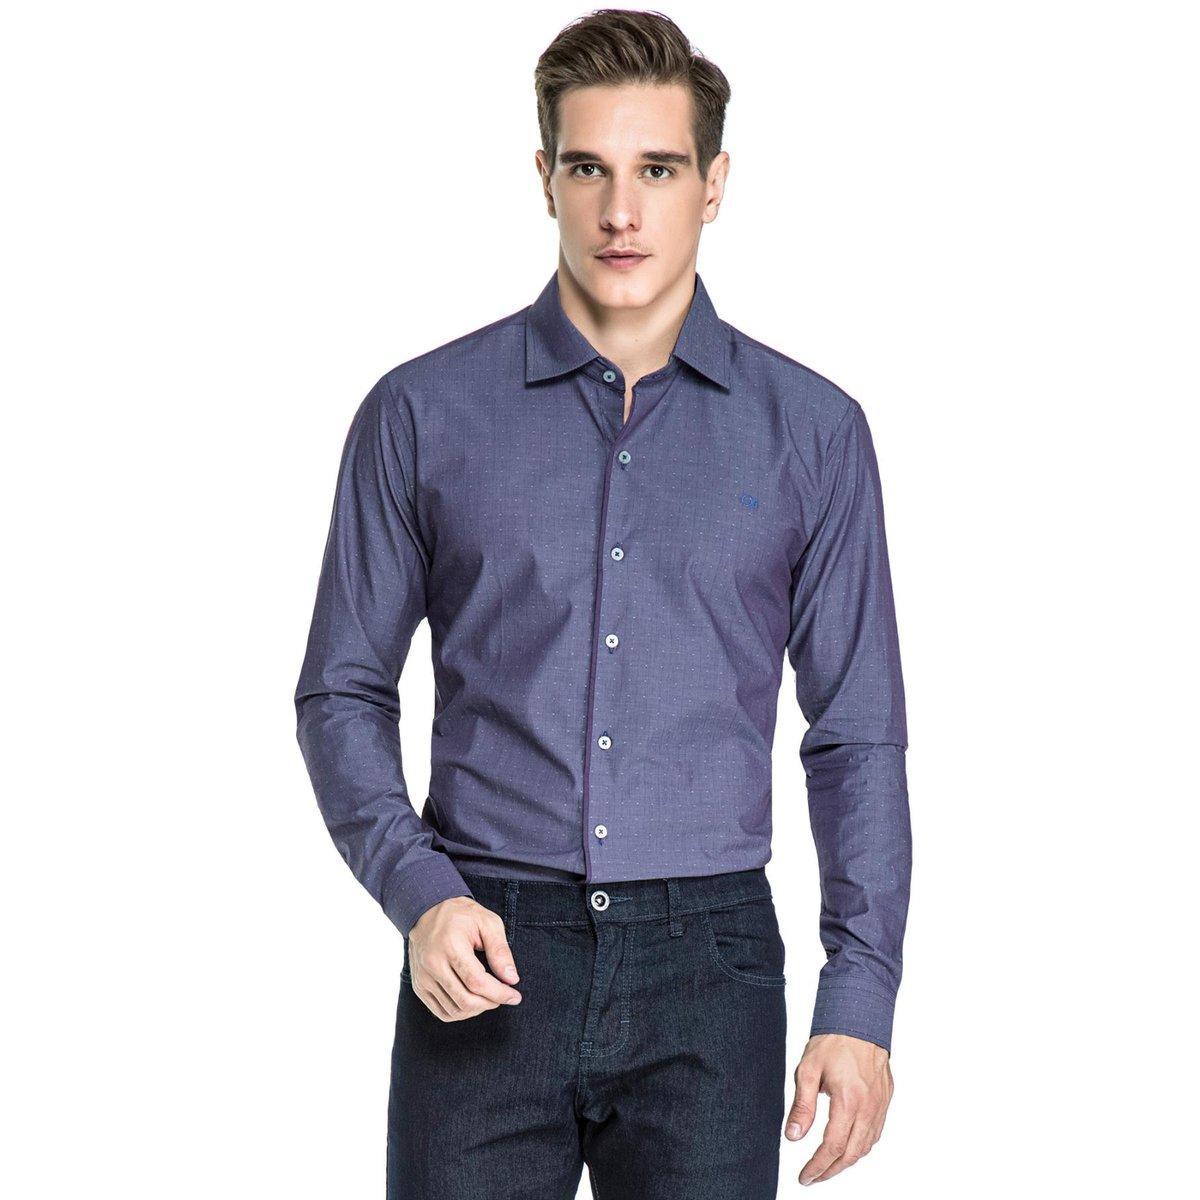 dddcd1833b Camisa Ogochi Maquinetada - Compre Agora